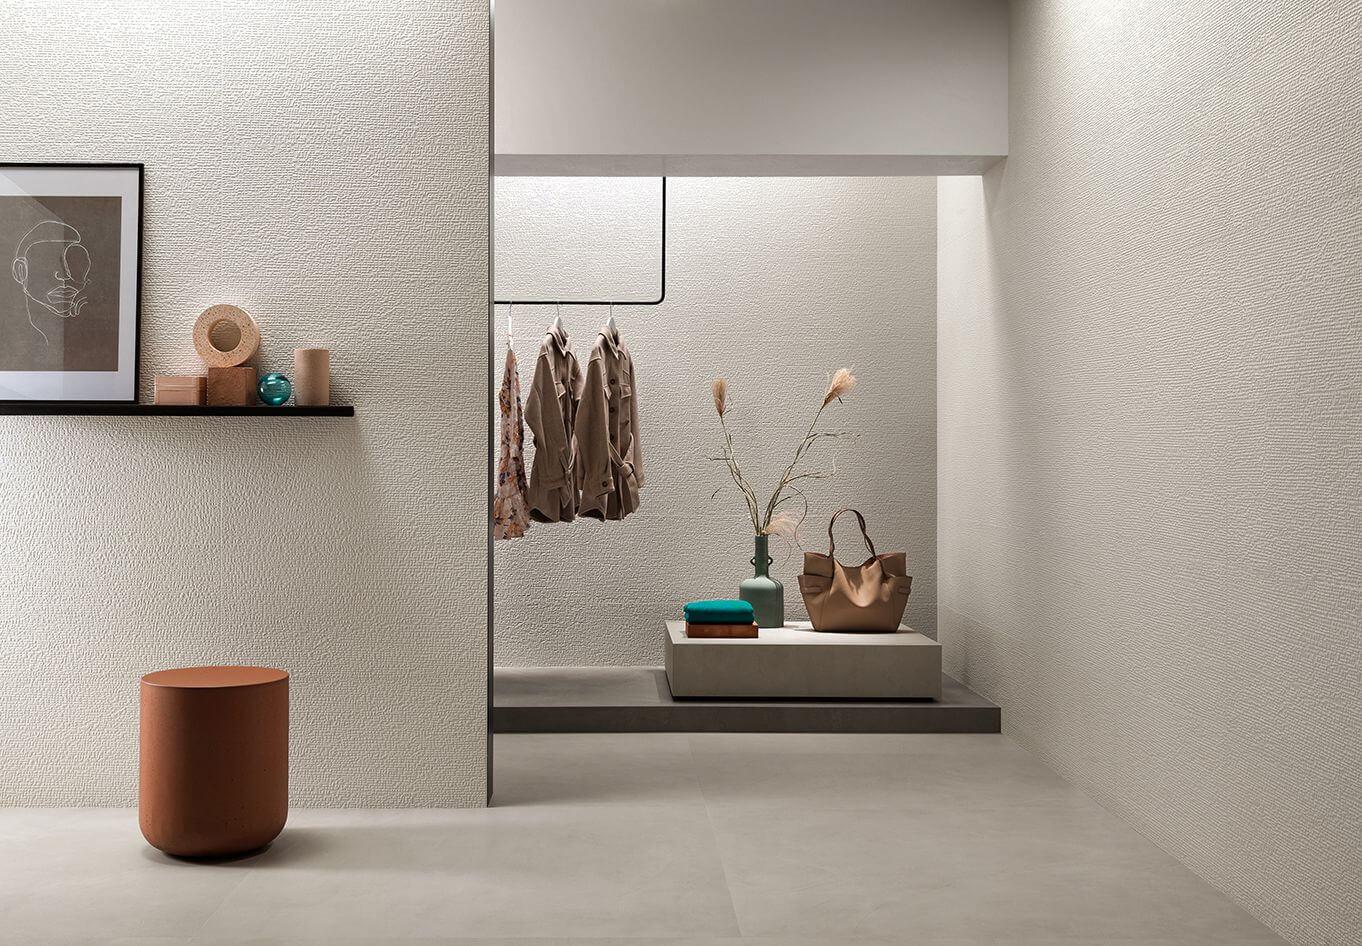 Milano Design Week 2021 - Brera, Fuorisalone